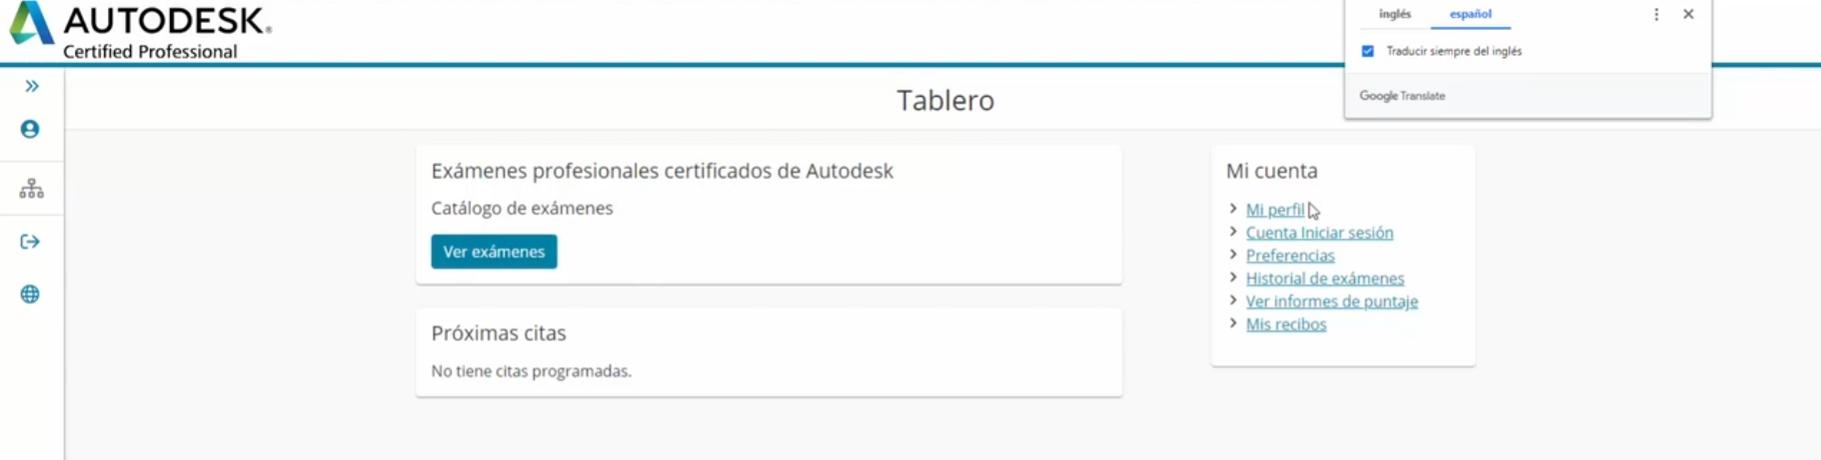 certificacion-autodesk-blog